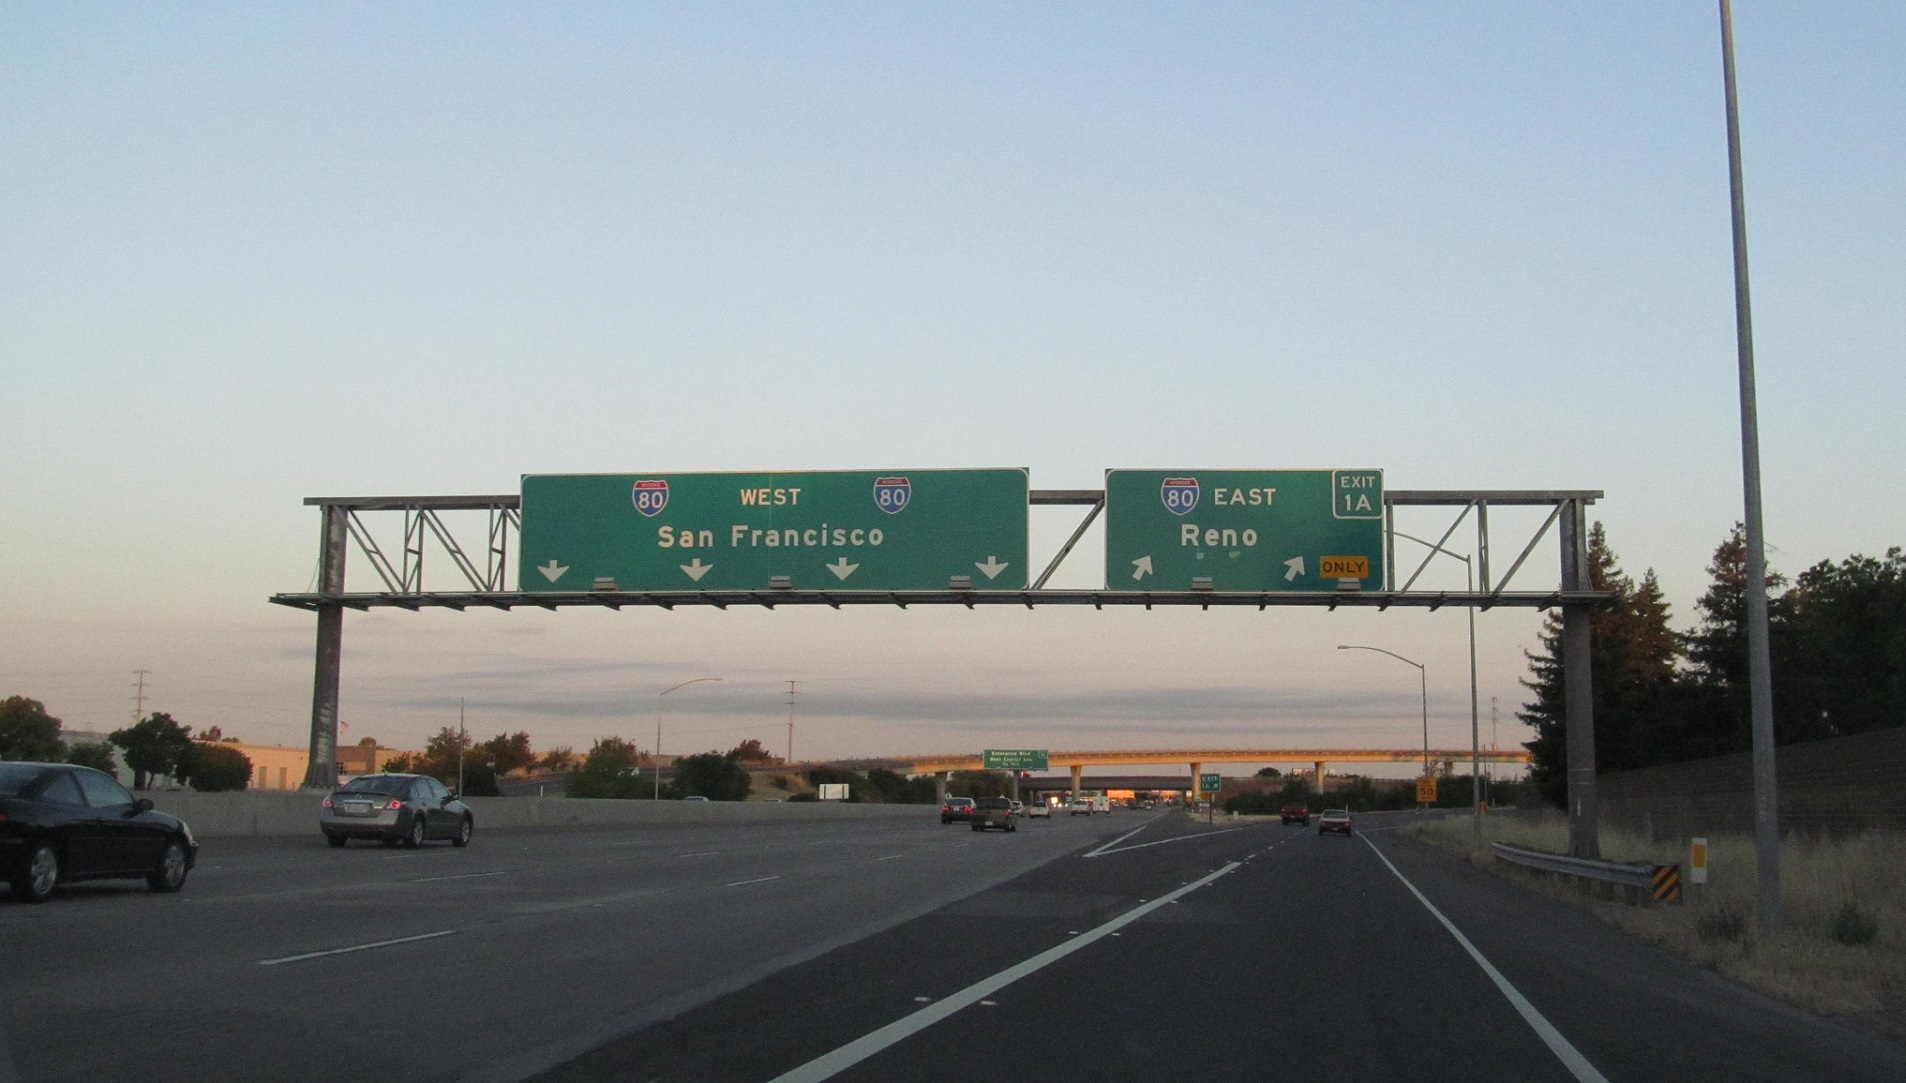 Más de 2.000 km de autopista eléctrica de Canadá a México